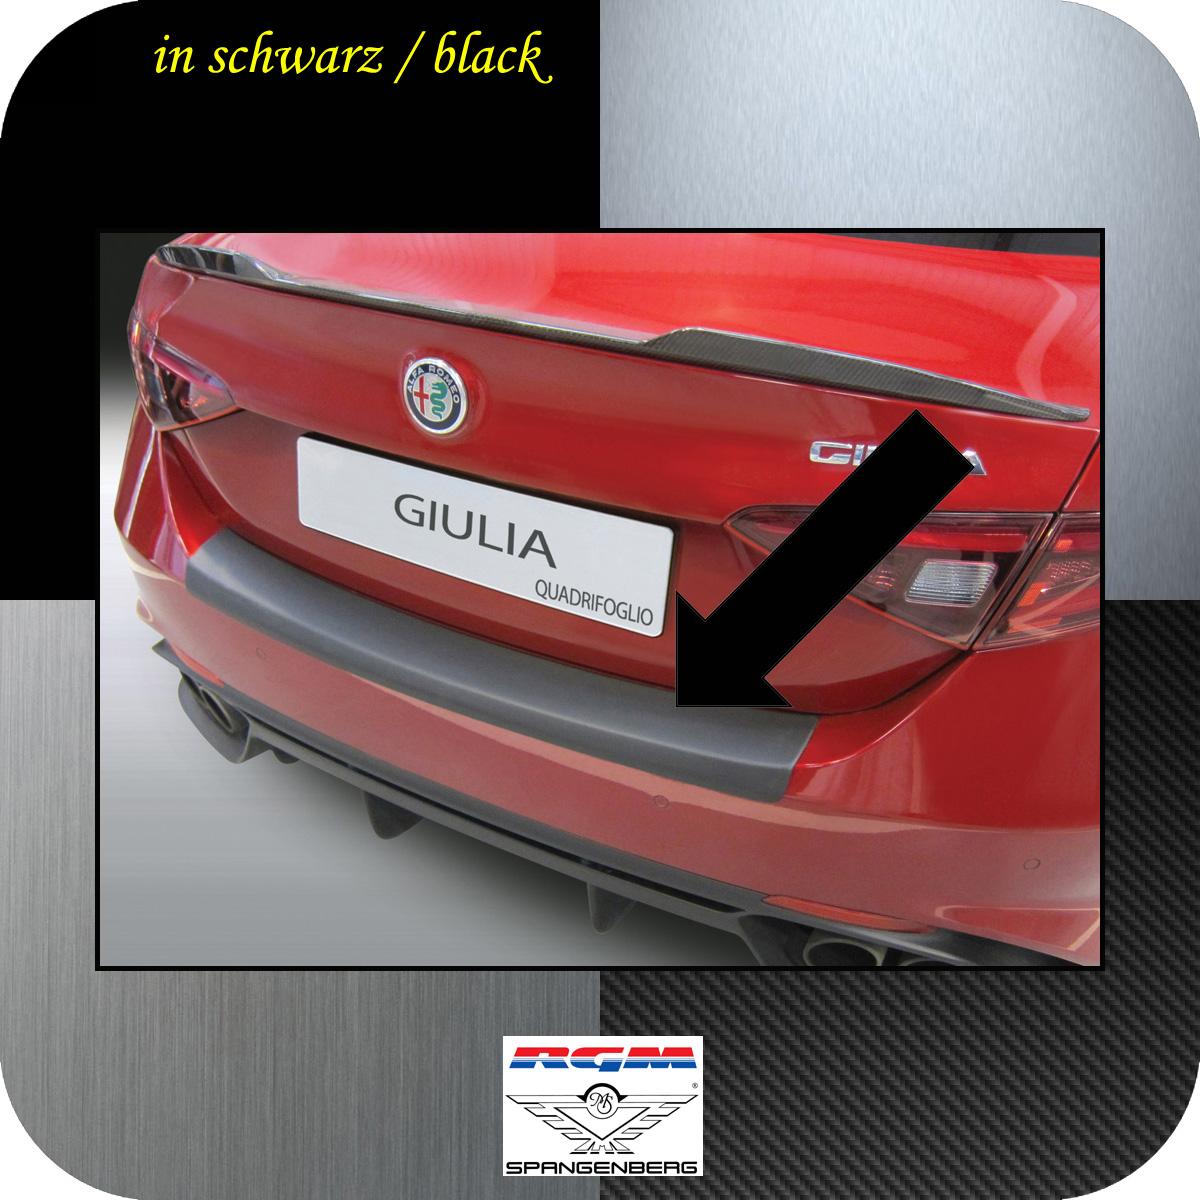 Ladekantenschutz schwarz Alfa Giulia Limo 952 nur Quadrifoglio 05.2016- 3500677